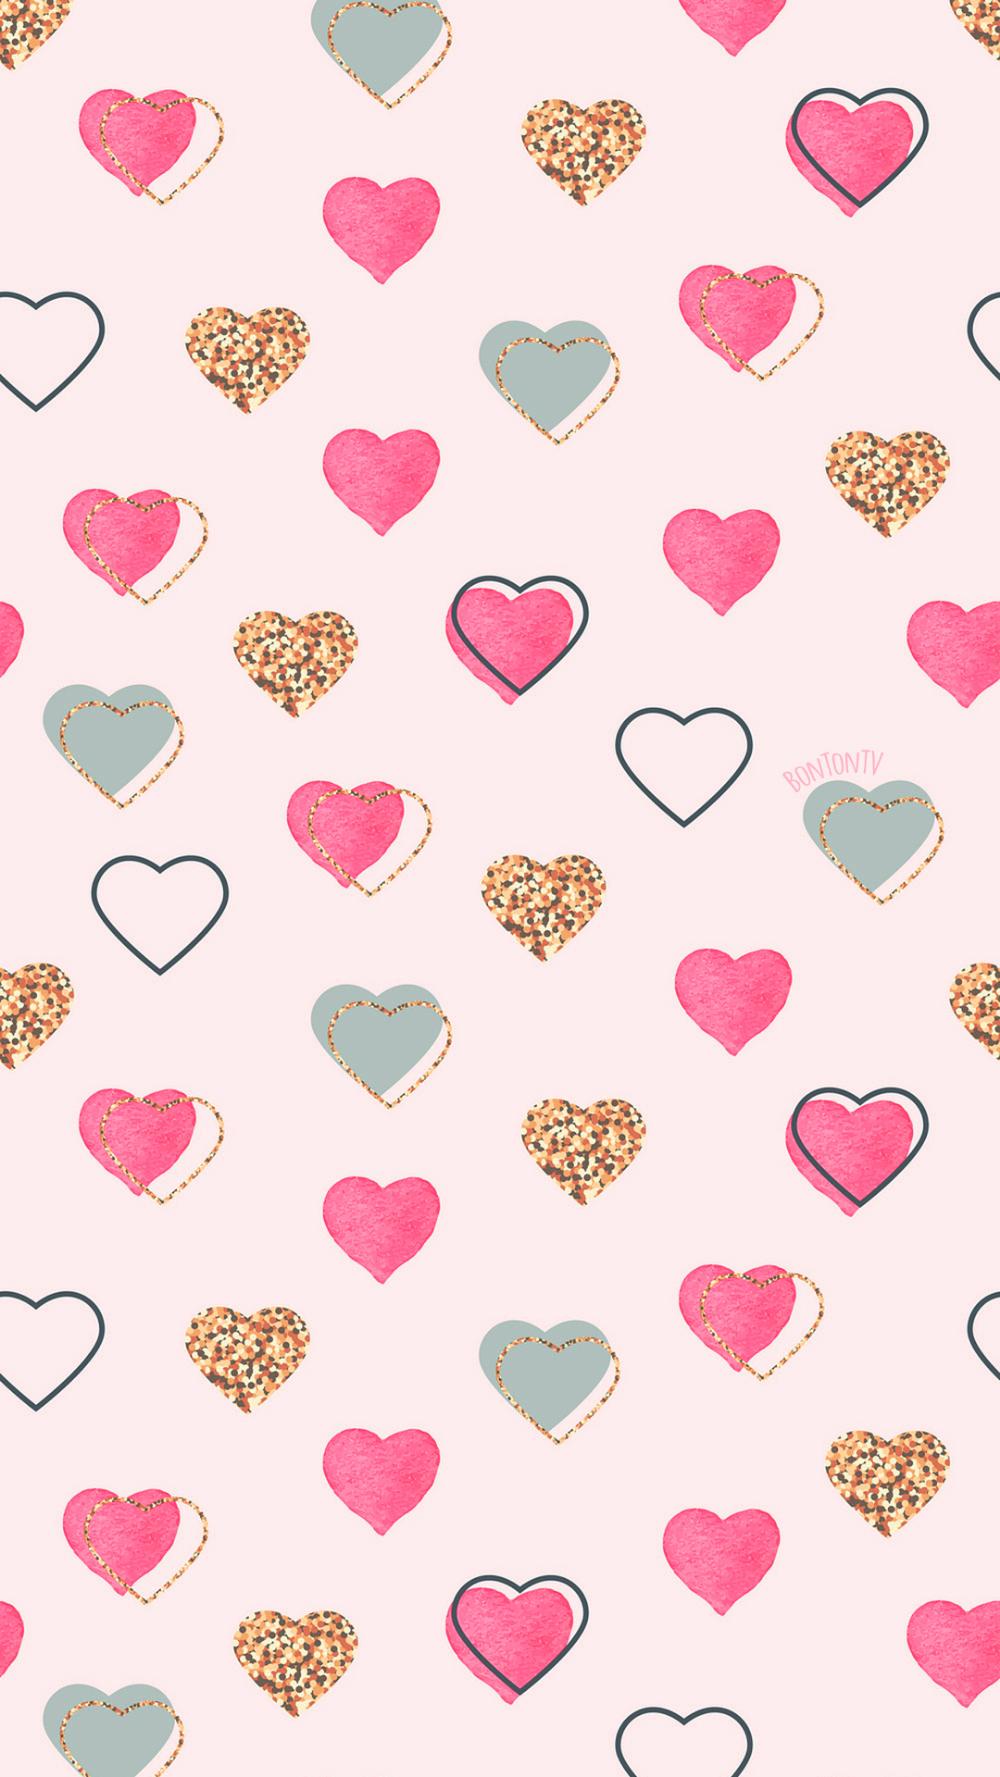 Phone Wallpaper Hd Von Bonton Tv Free Download 1080x1920 Iphone Hintergrundbilder Iphone Wallpaper Pattern Pink Wallpaper Iphone Wallpaper Iphone Cute